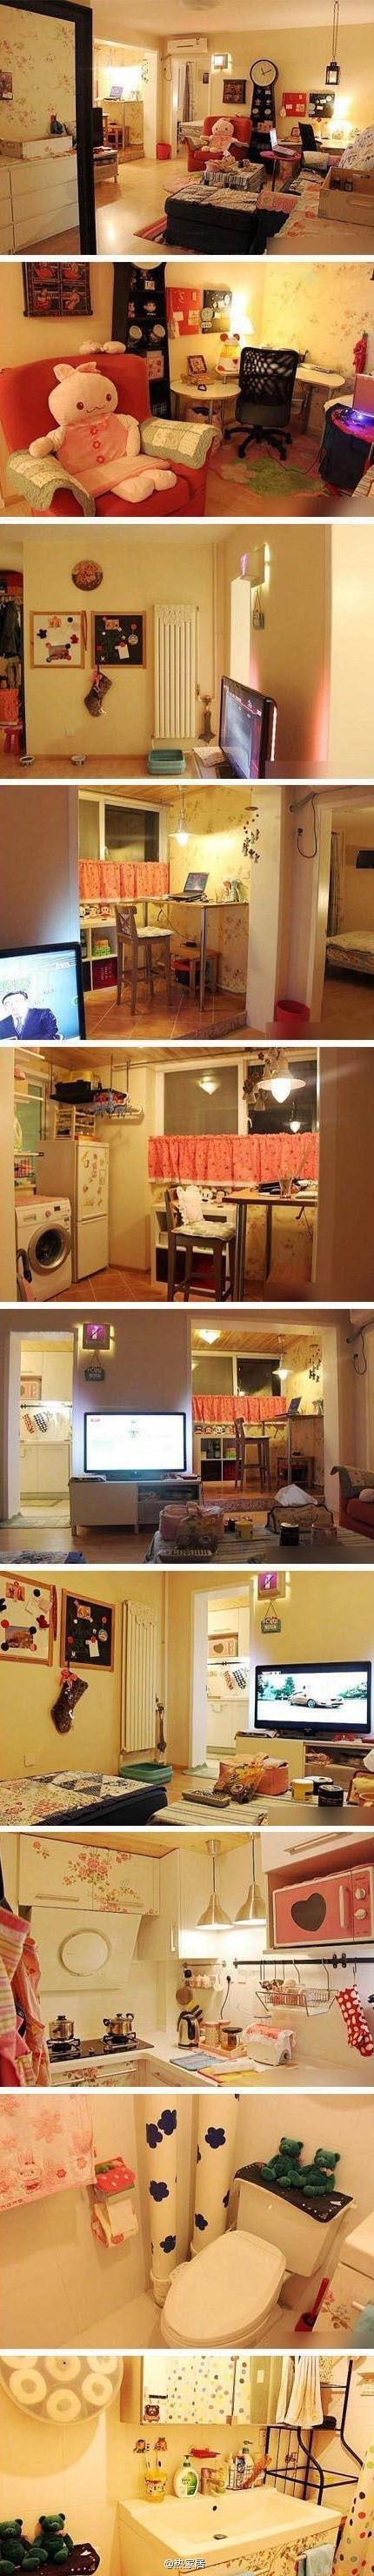 My dream single girl apartment....soon soon.....con paciencia se llega lejos =)